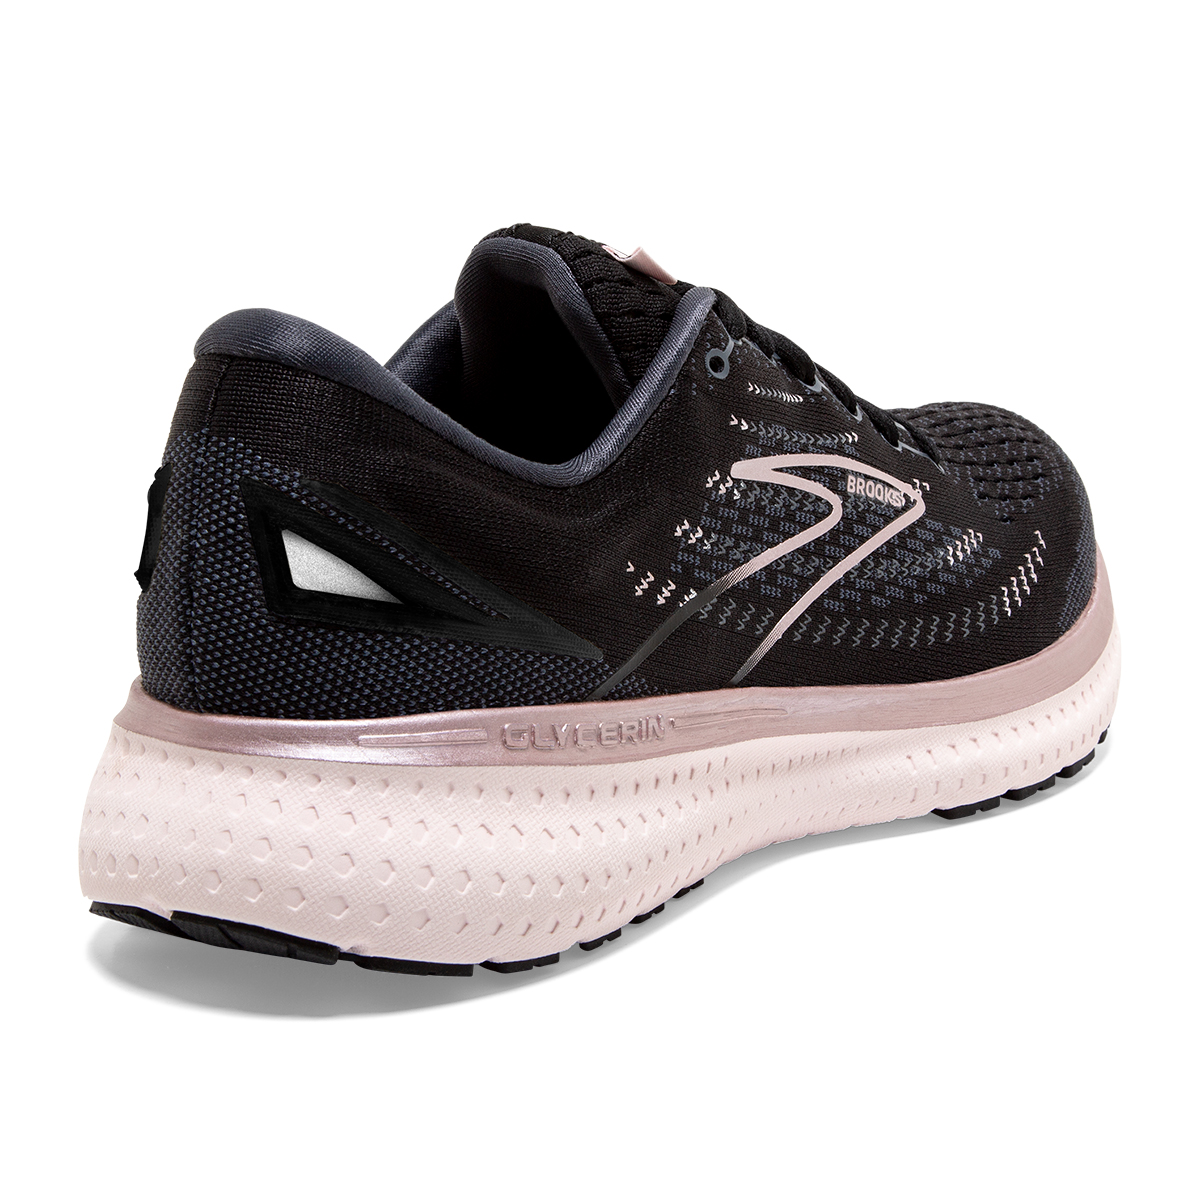 Women's Brooks Glycerin 19 Running Shoe - Color: Black/Ombre/Metallic - Size: 5 - Width: Regular, Black/Ombre/Metallic, large, image 5